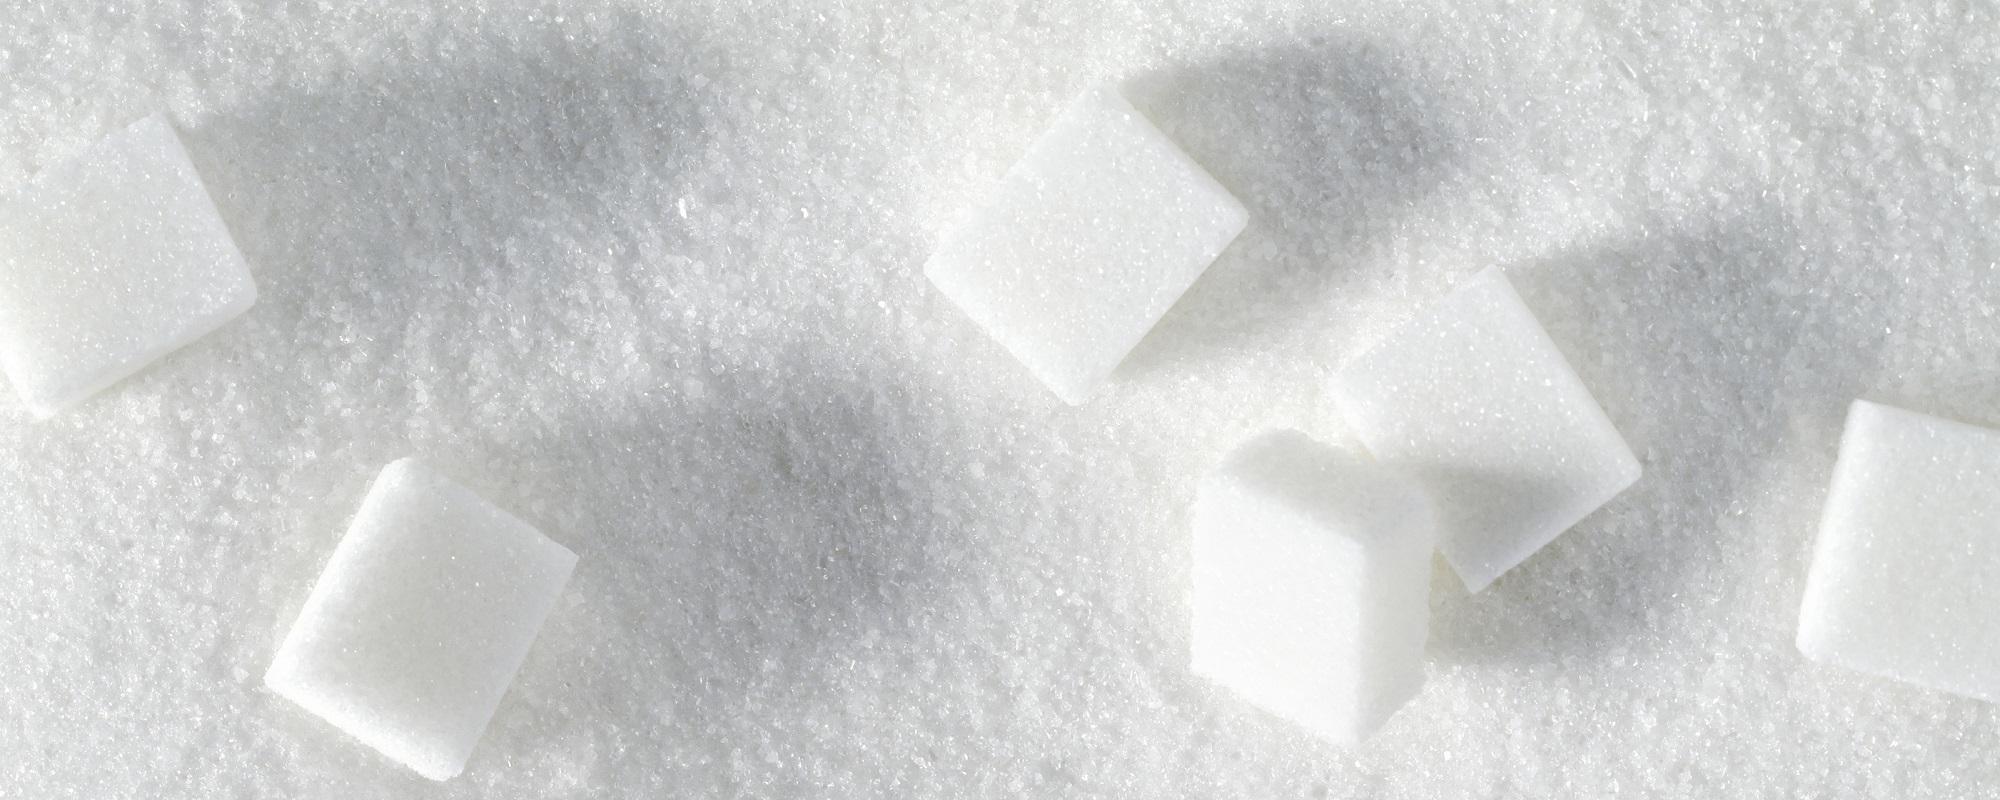 Glycosylation: The Sweeter Side of Proteomics